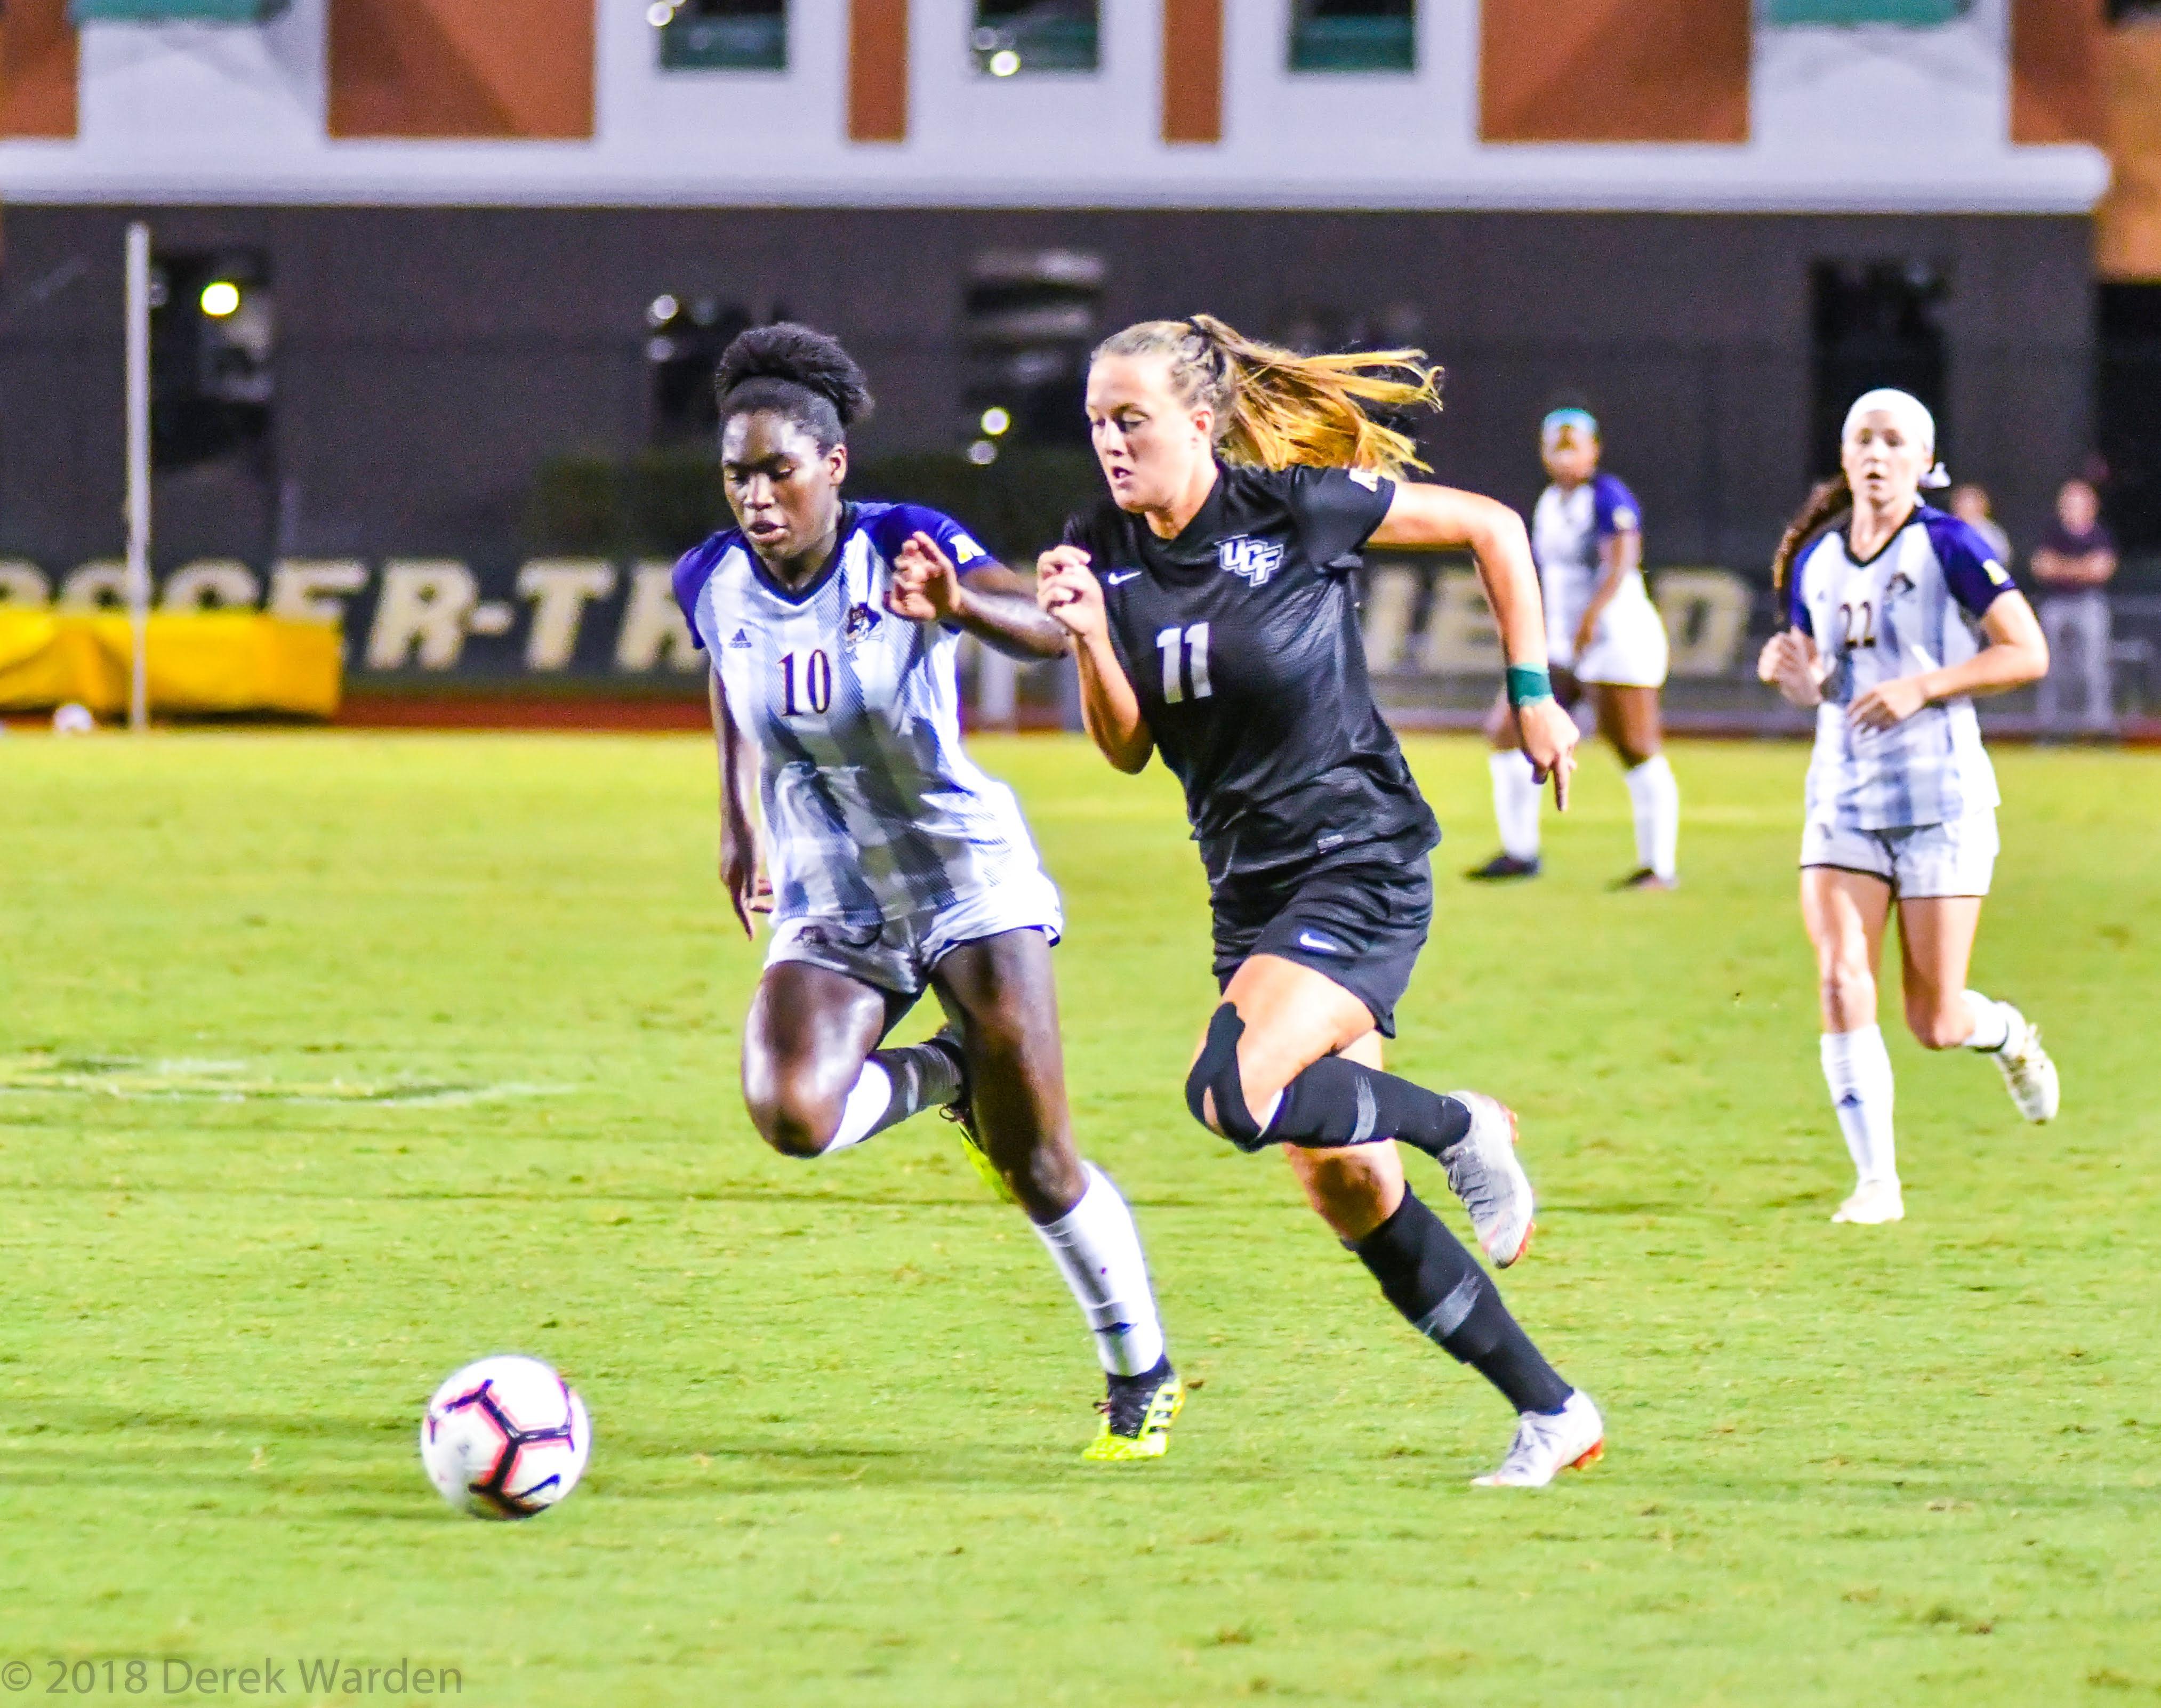 Stefanie Sanders UCF Women's Soccer